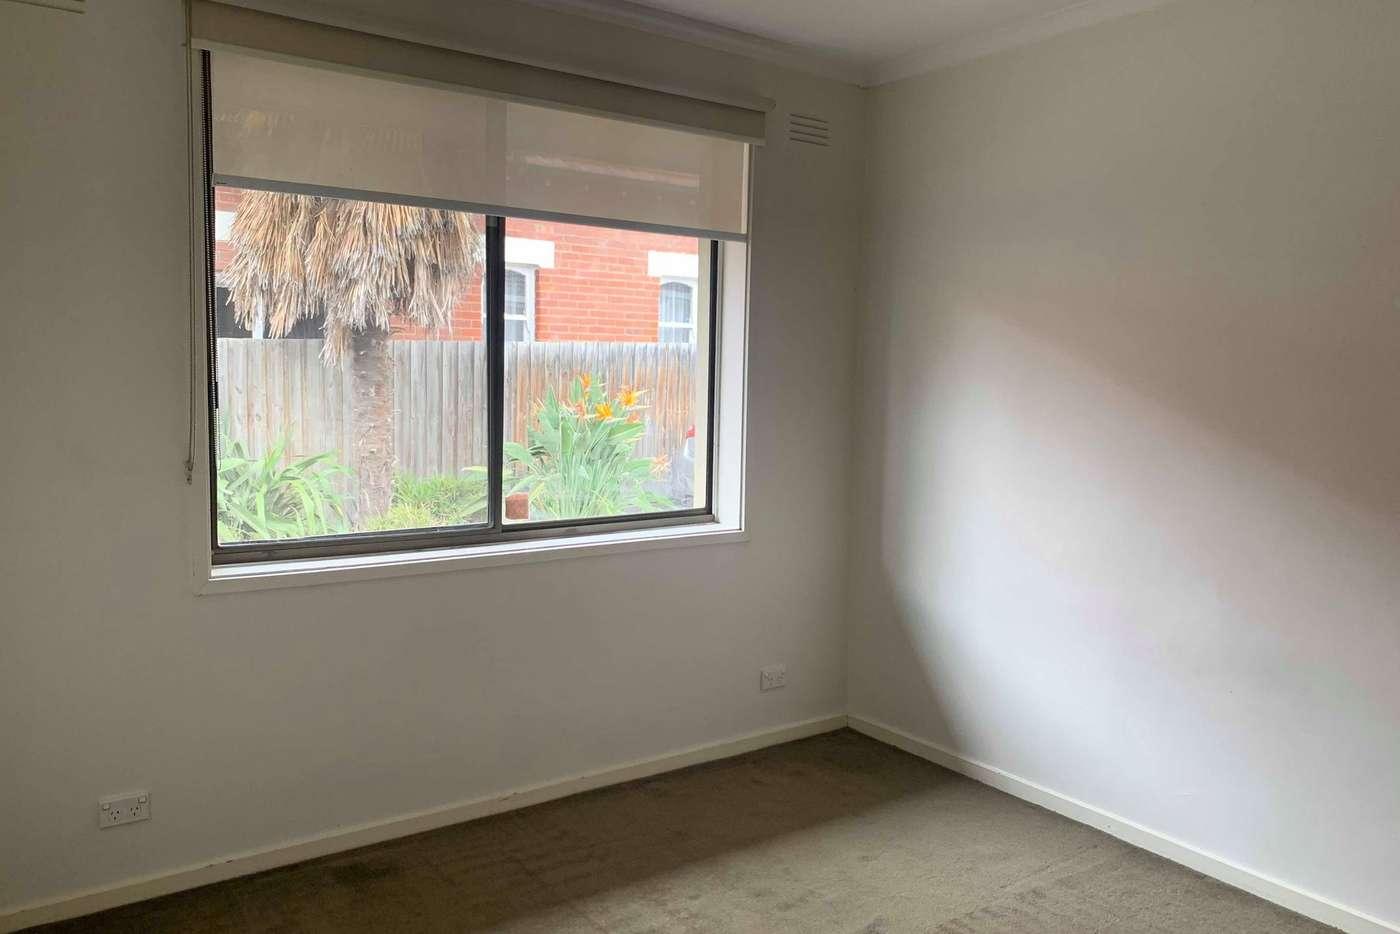 Sixth view of Homely unit listing, 2/67 Blyth Street, Brunswick VIC 3056